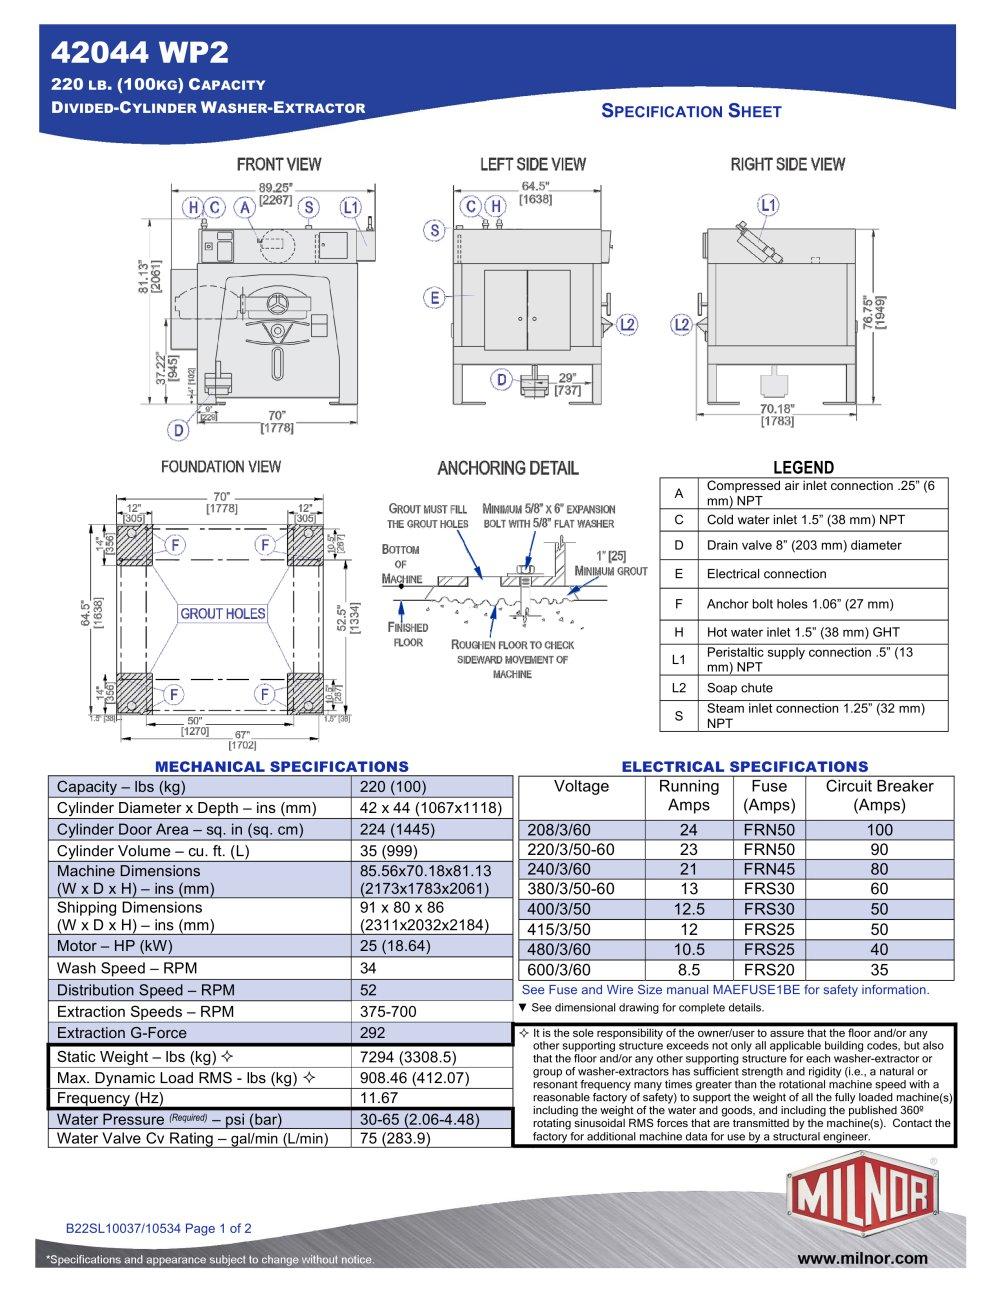 milnor dryer wiring diagram download wiring diagrams u2022 rh wiringdiagrammedia today Kenmore Electric Dryer Wiring Diagram Roper Dryer Wiring Diagram